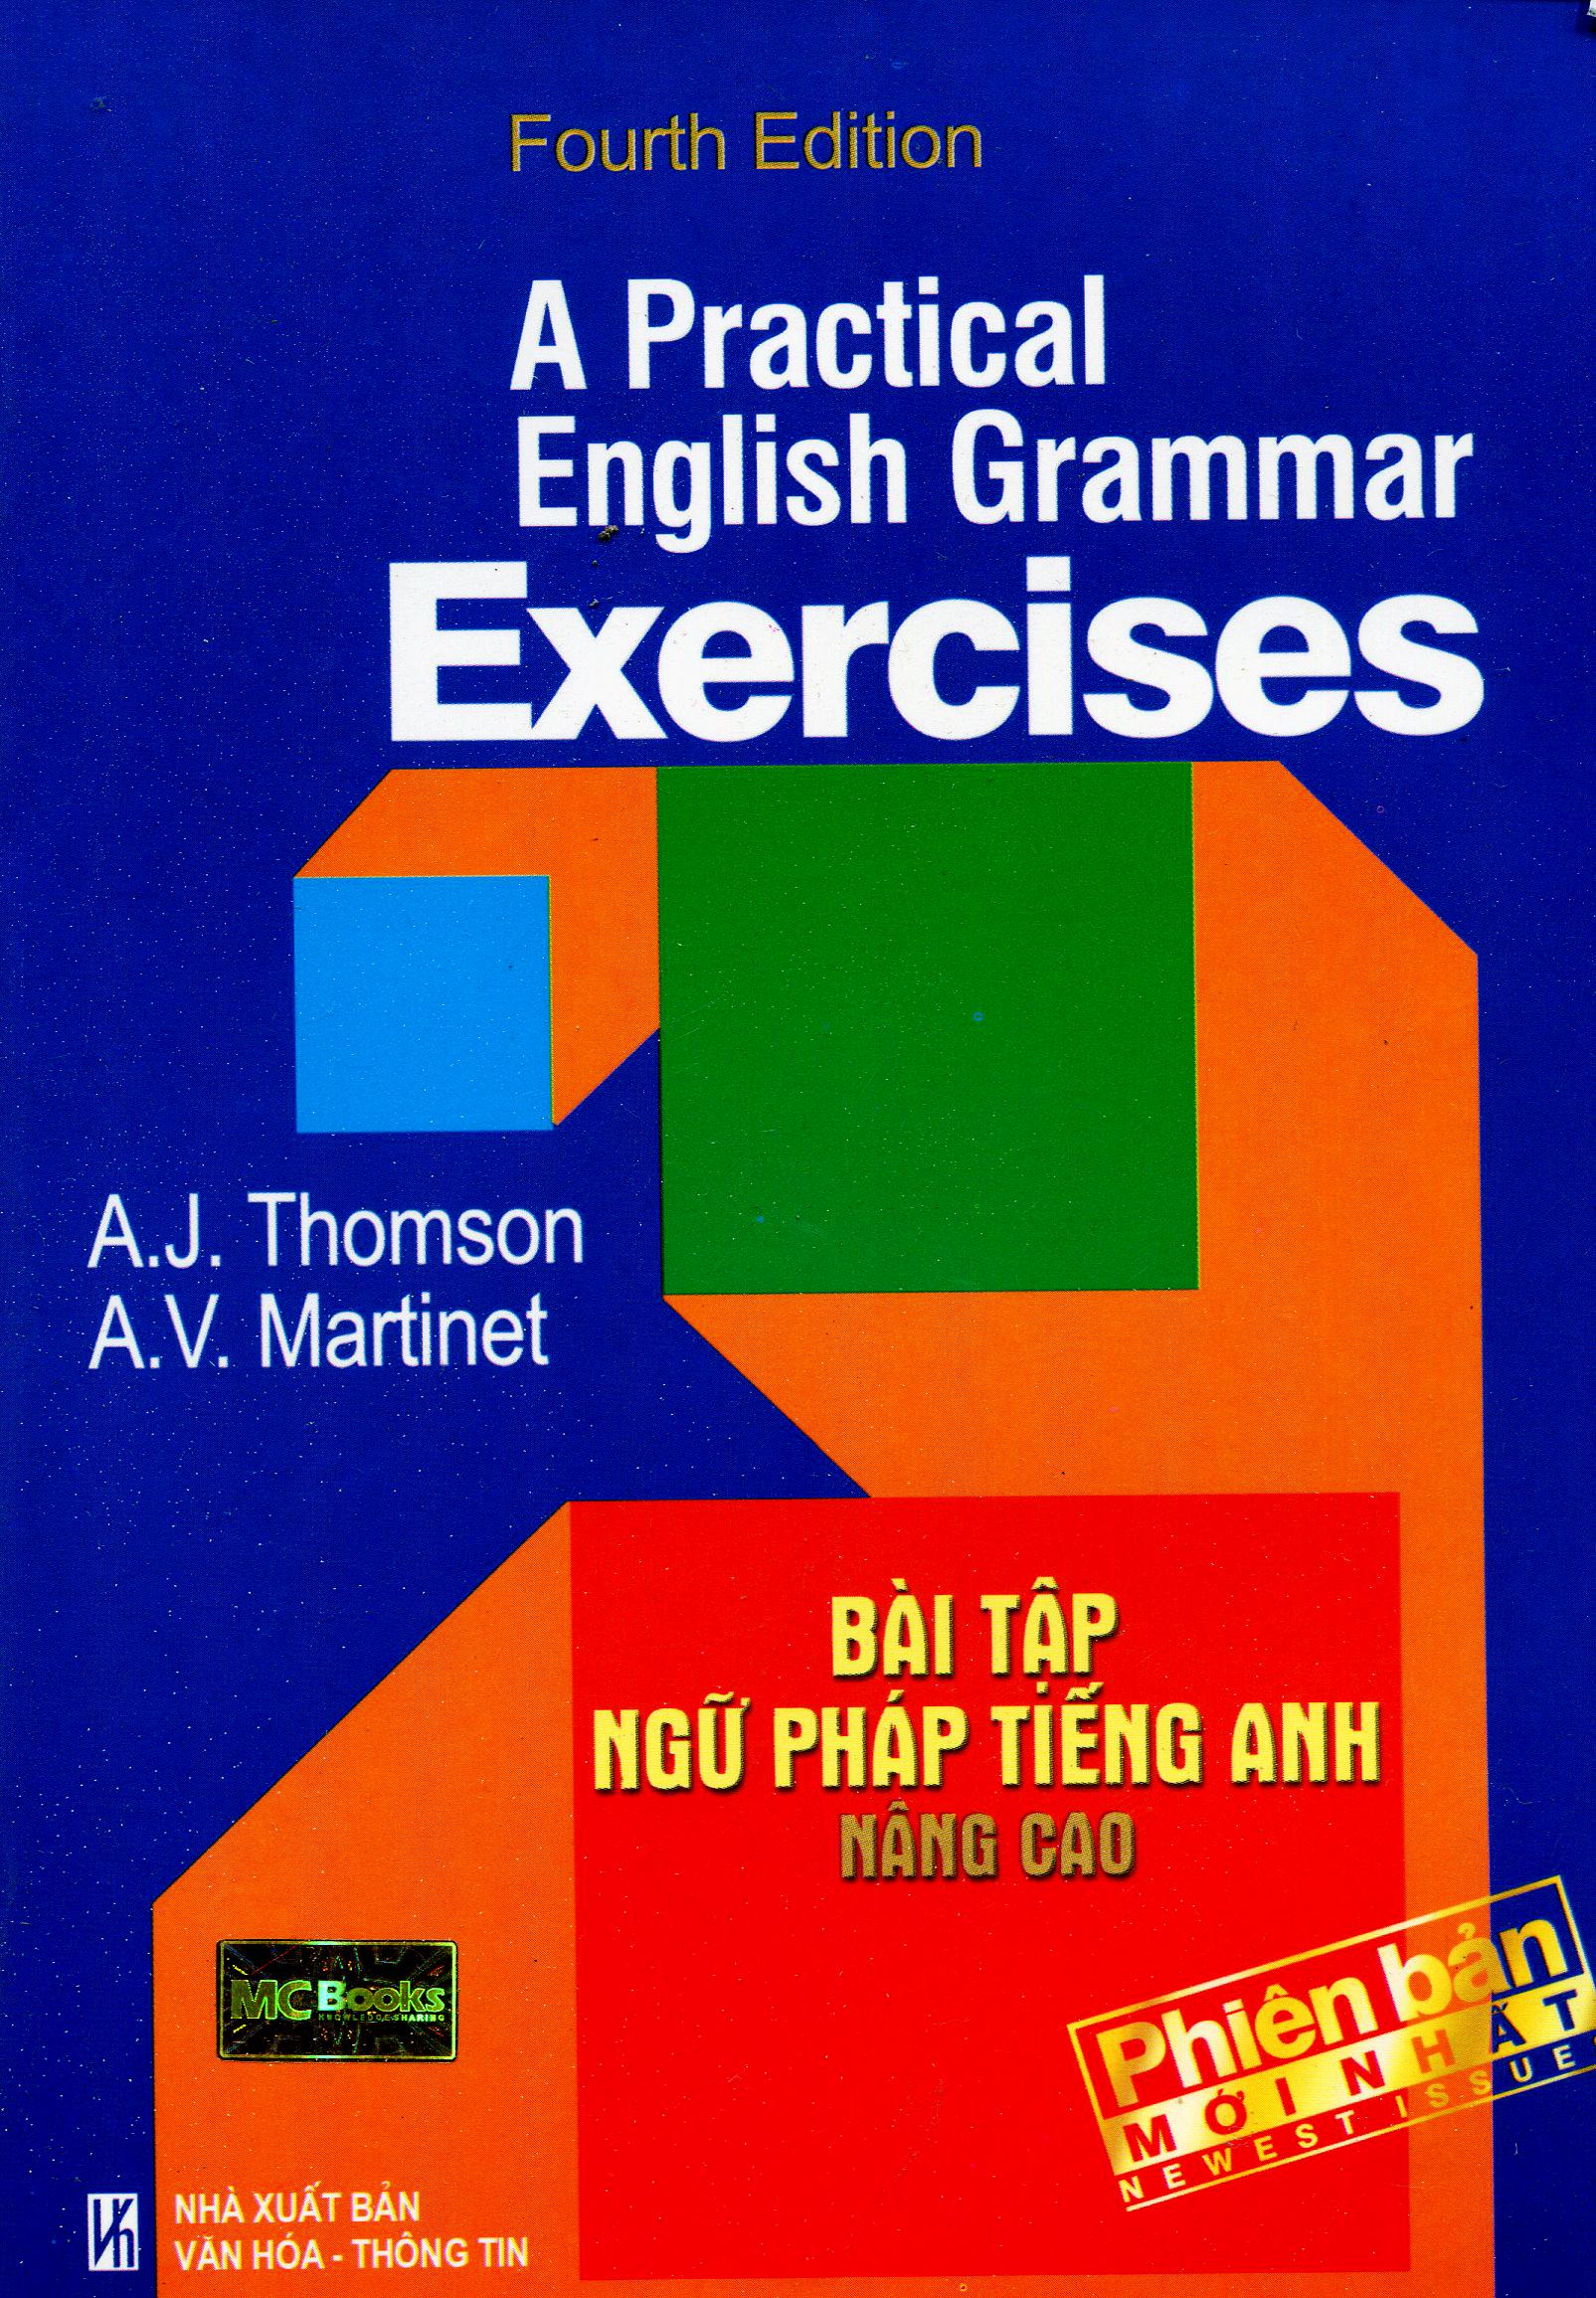 Bìa sách A Practical English Grammar Exercises